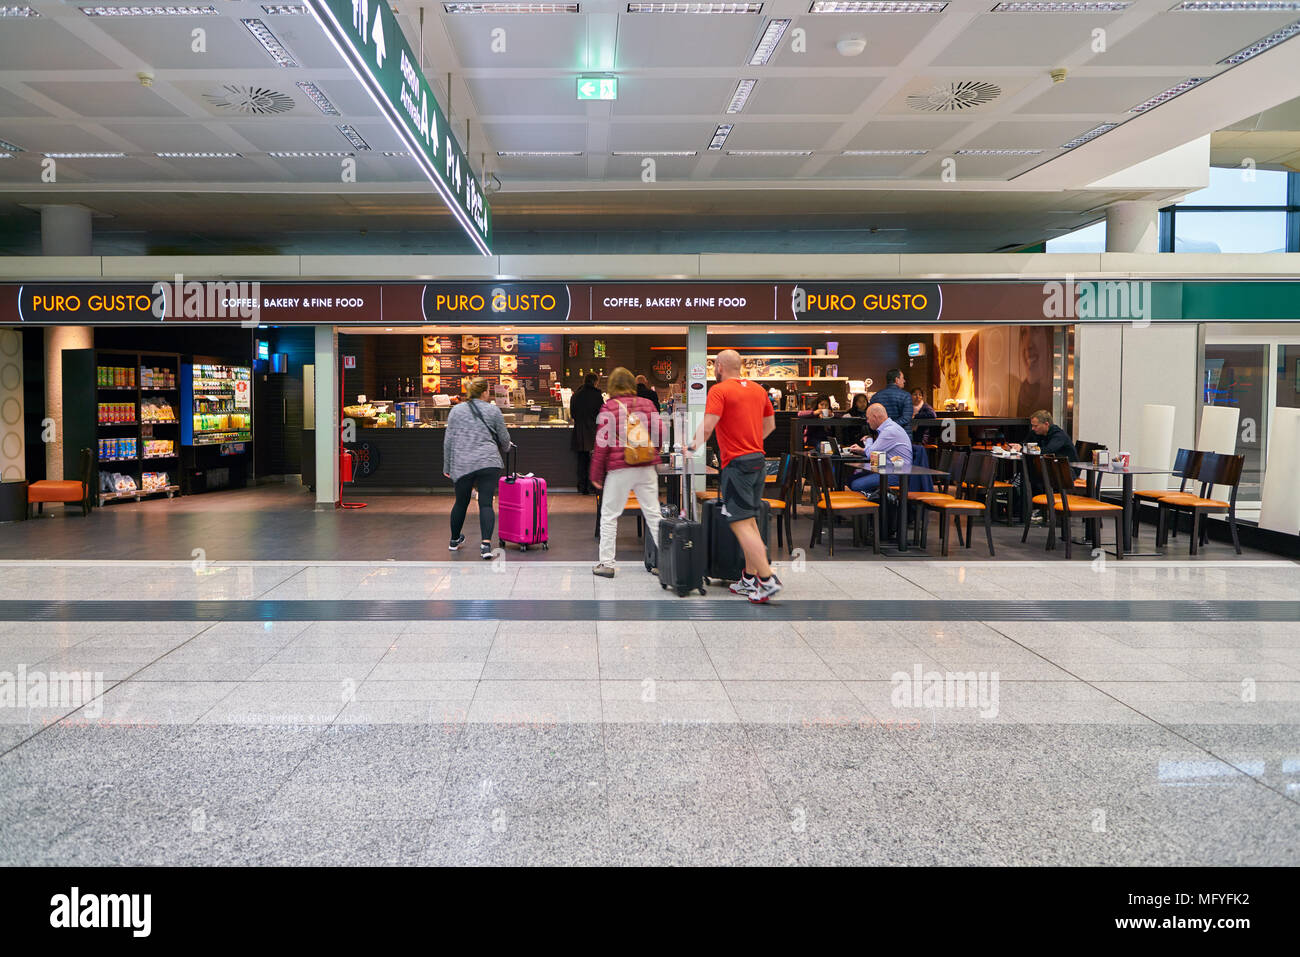 Mailand Malpensa ITALIEN - ca. November 2017: Puro Gusto am Flughafen Milano-Malpensa. Stockbild